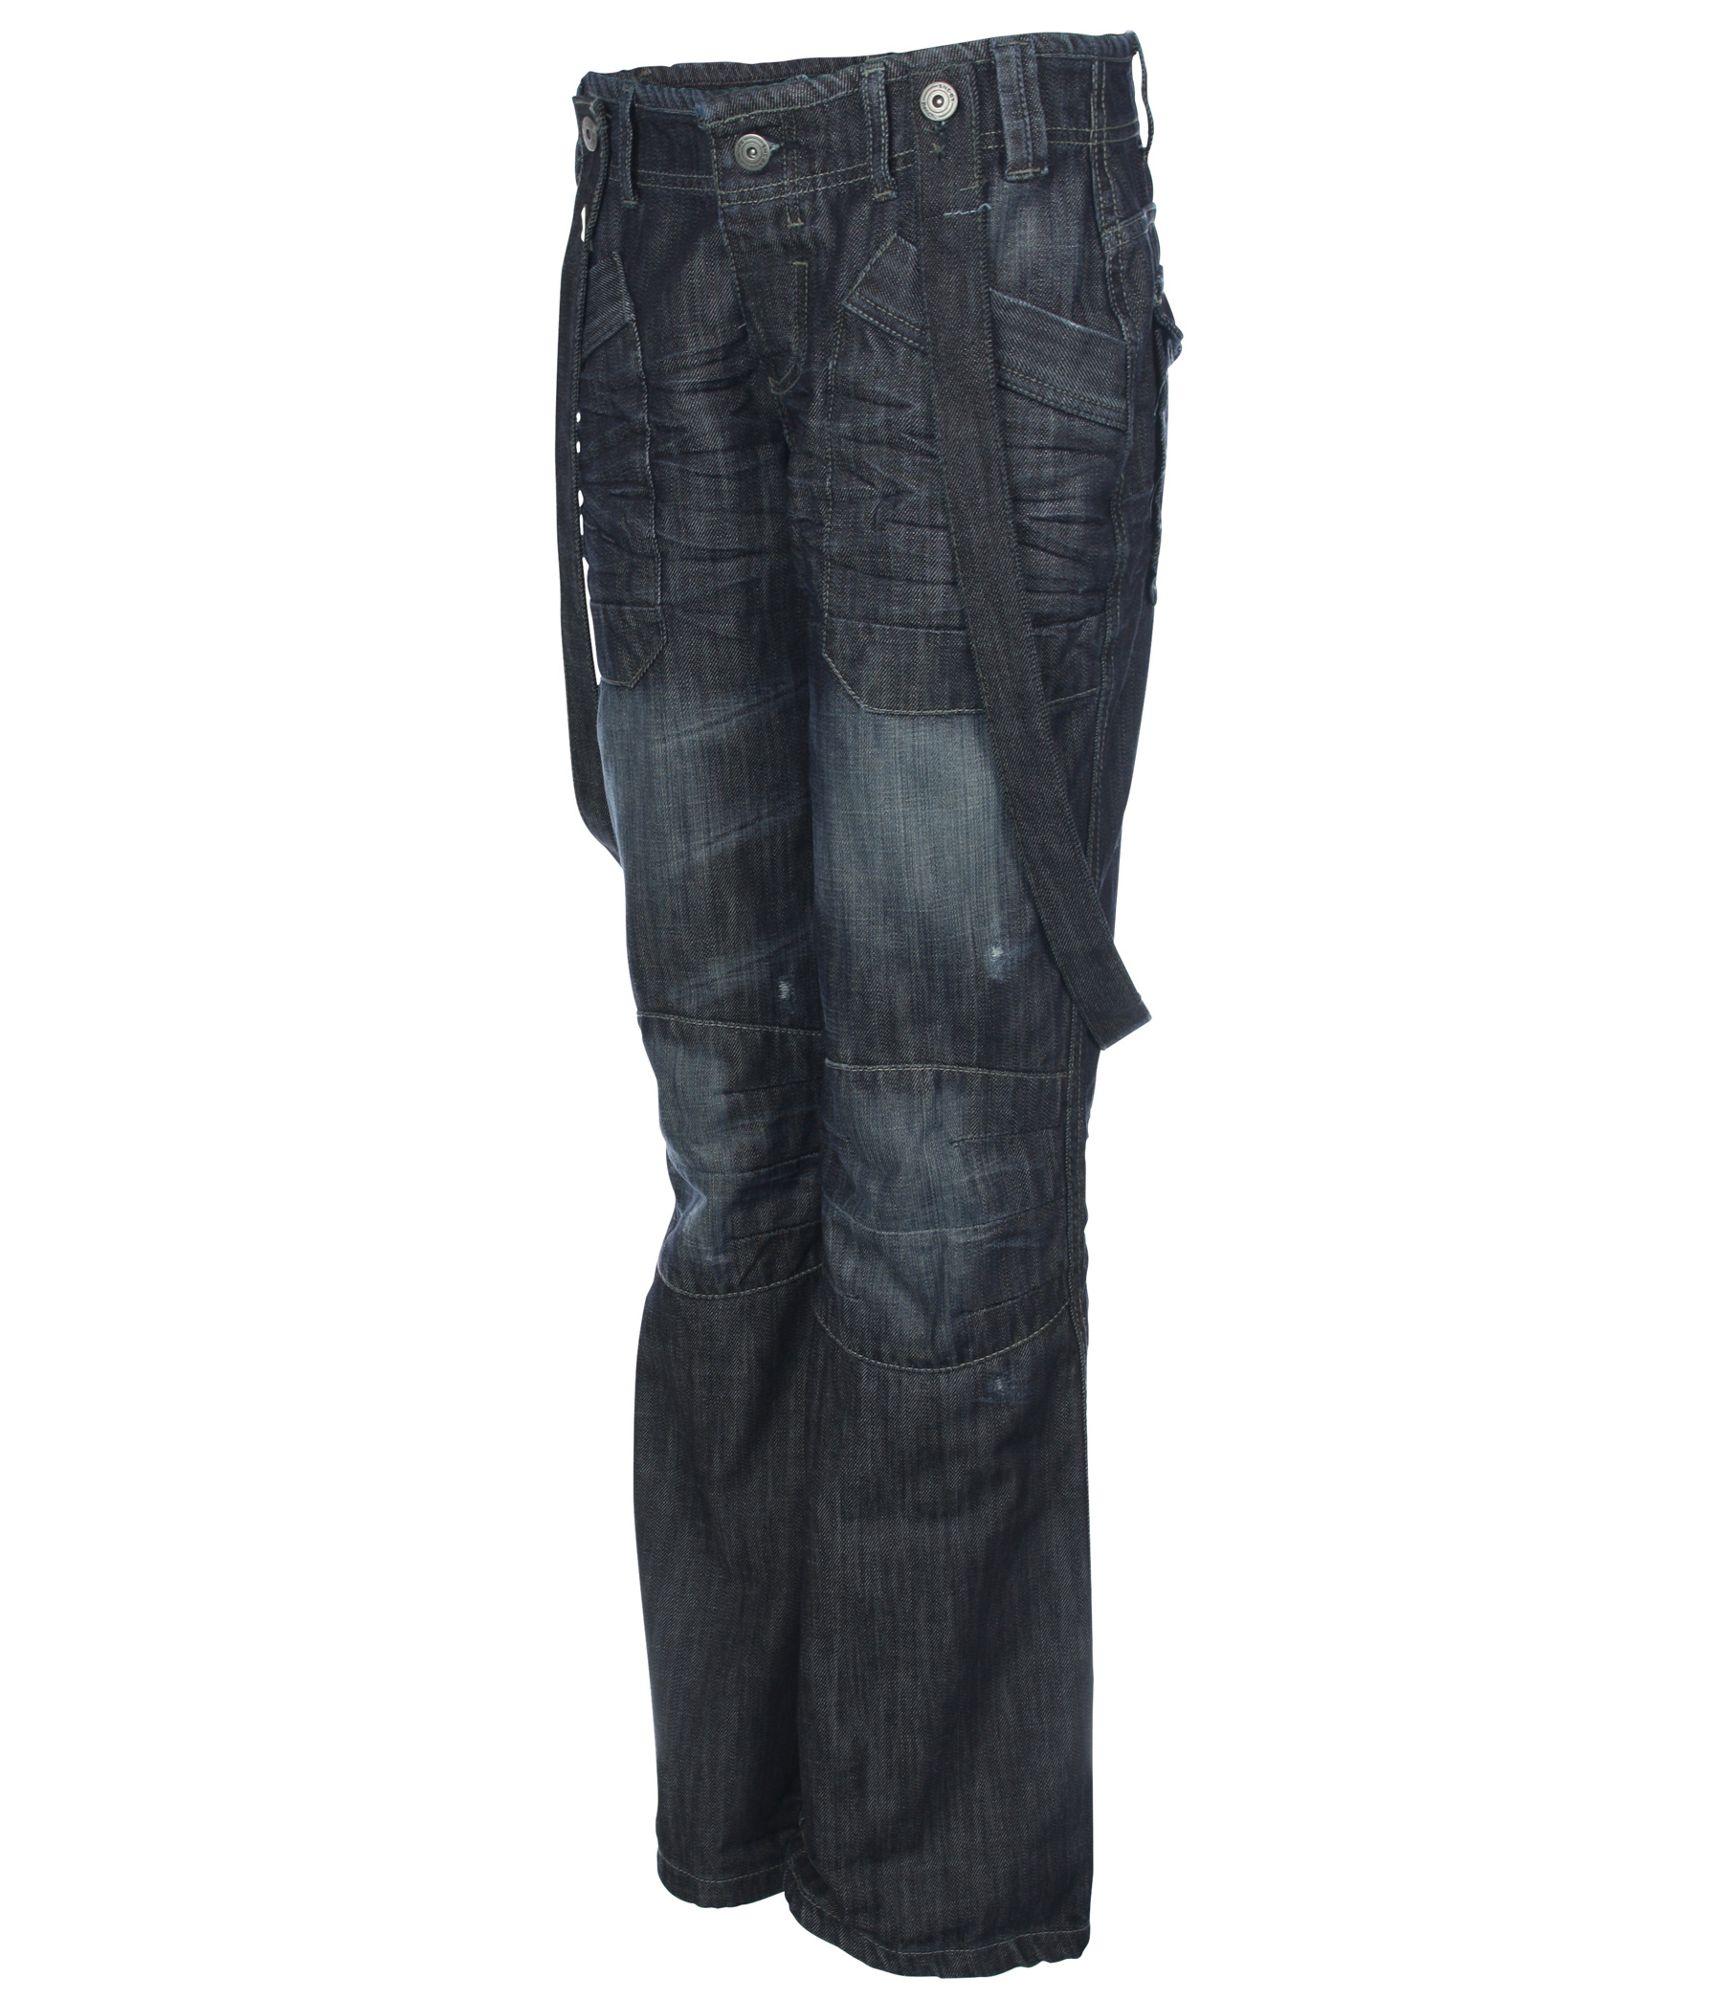 Bench Illuminate Loose Slouch Jeans in Denim Dark Wash (Blue)